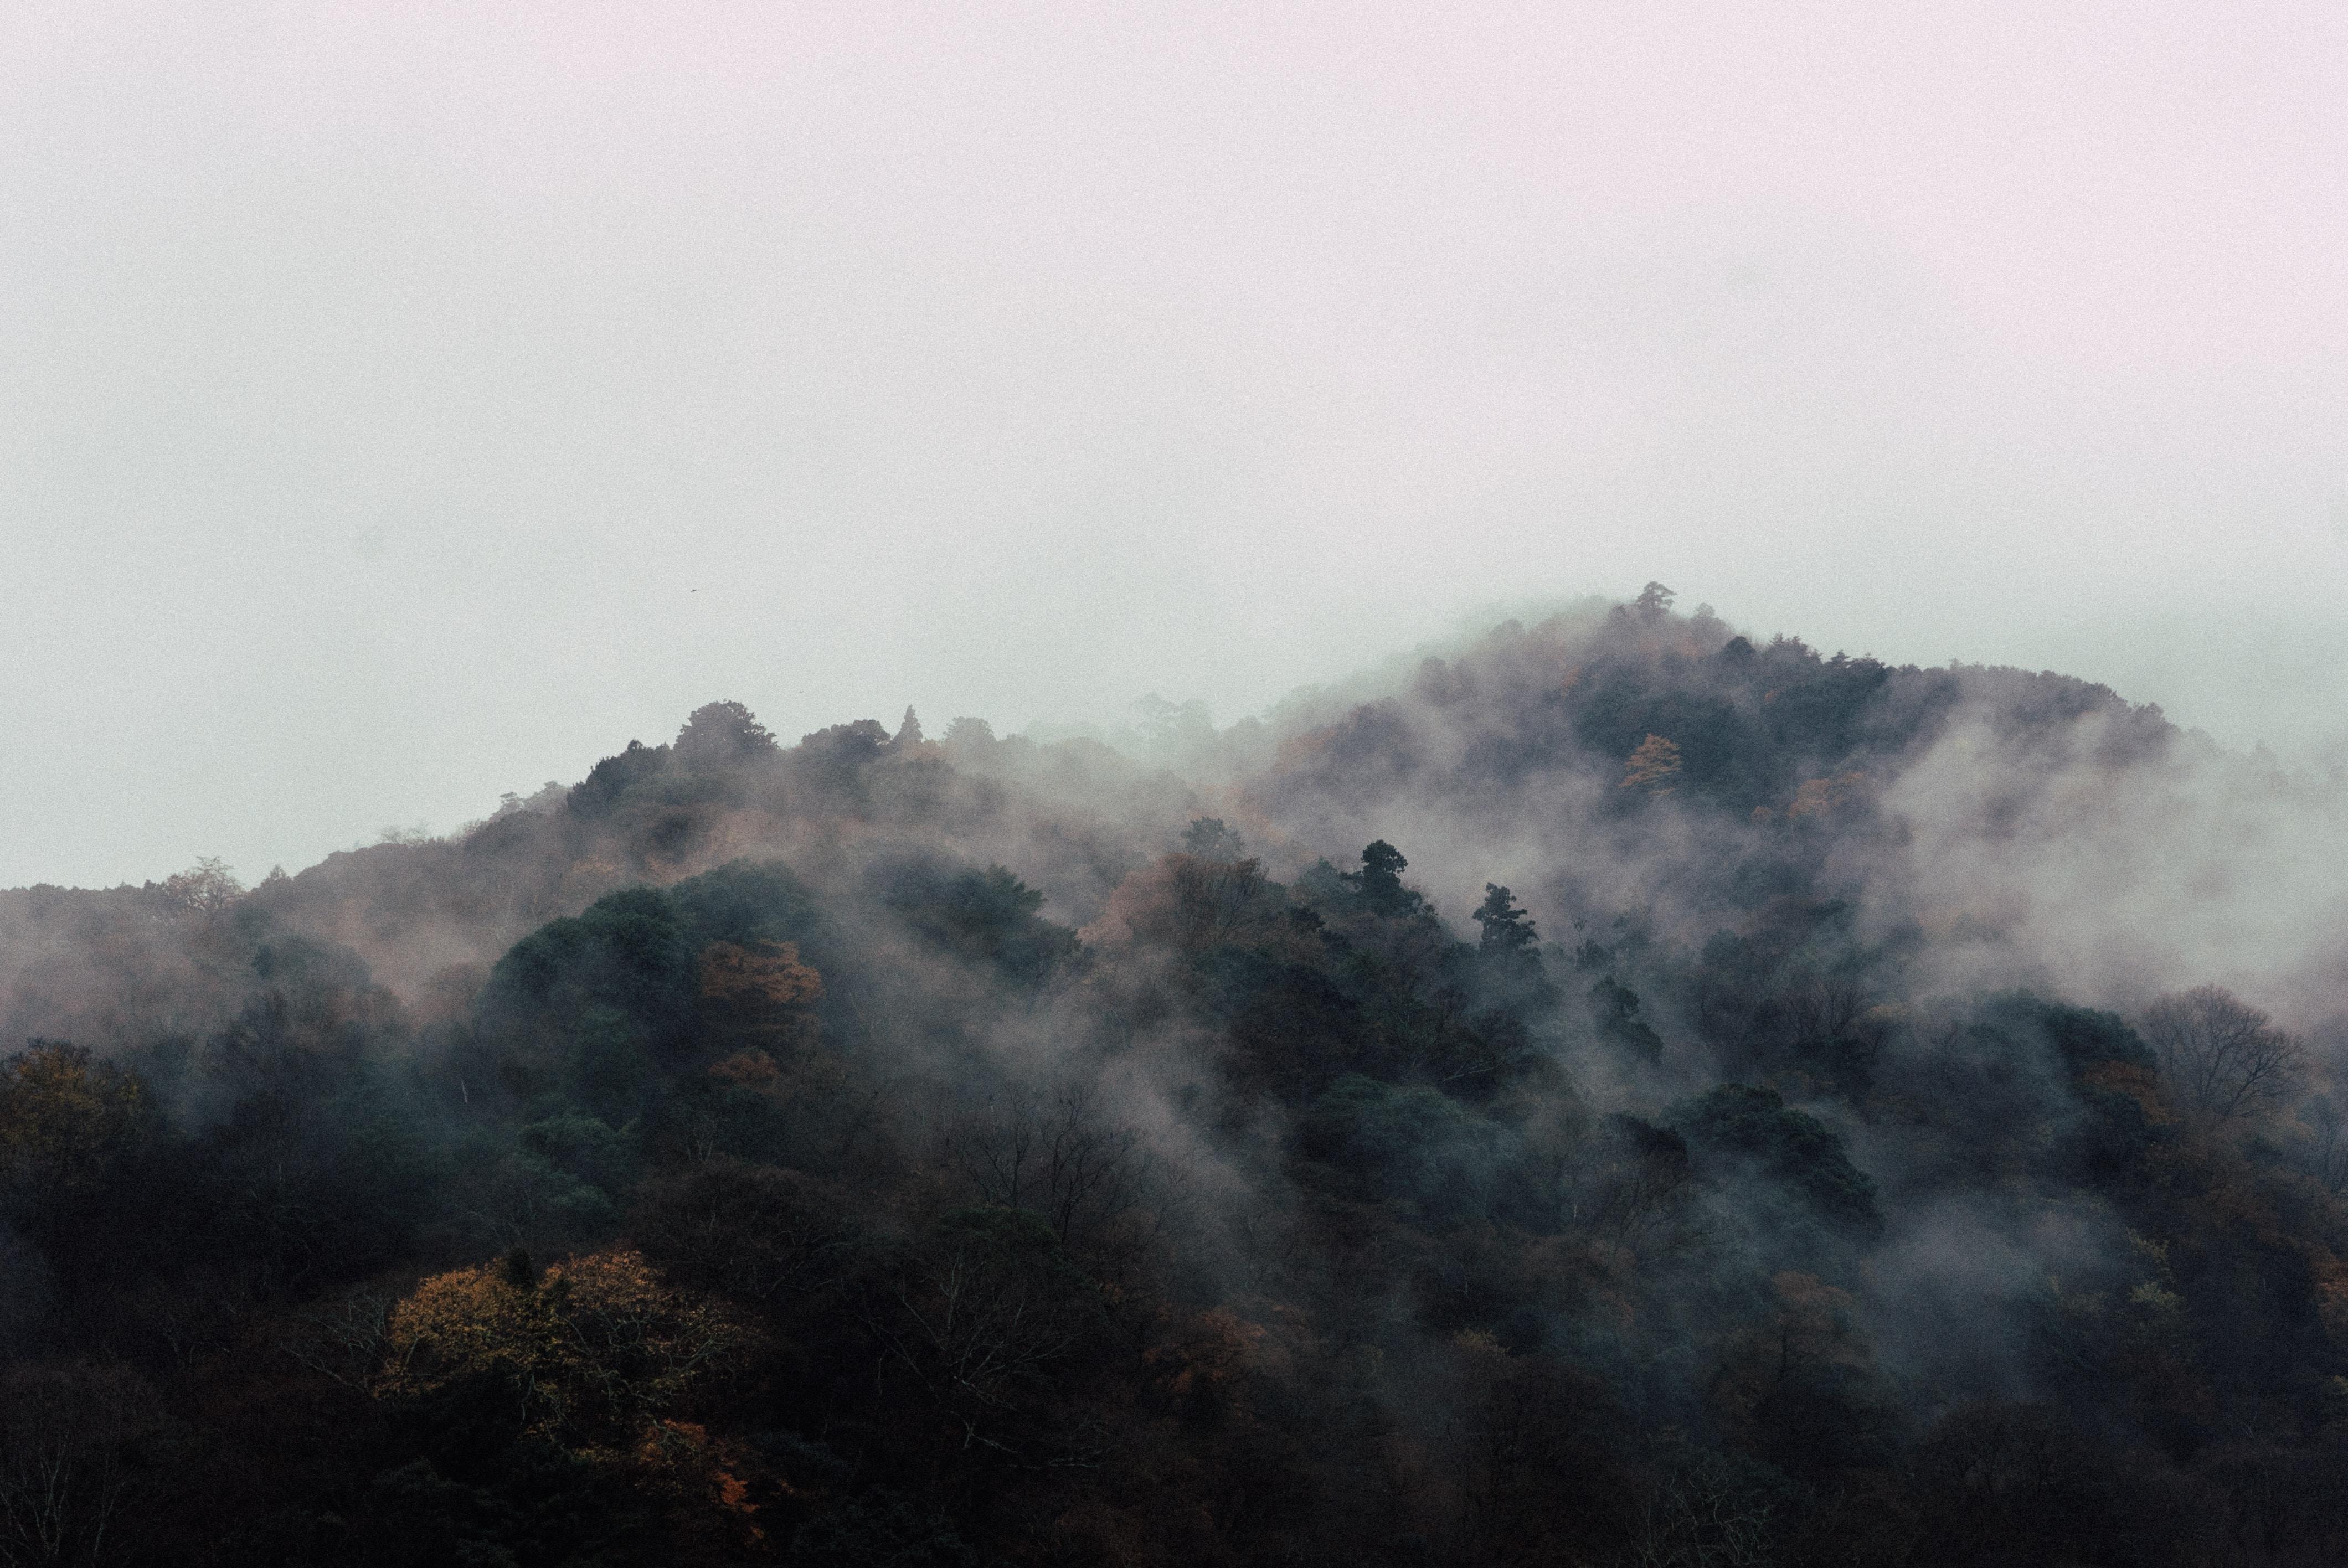 A morning haze over wooded hills in Arashiyama